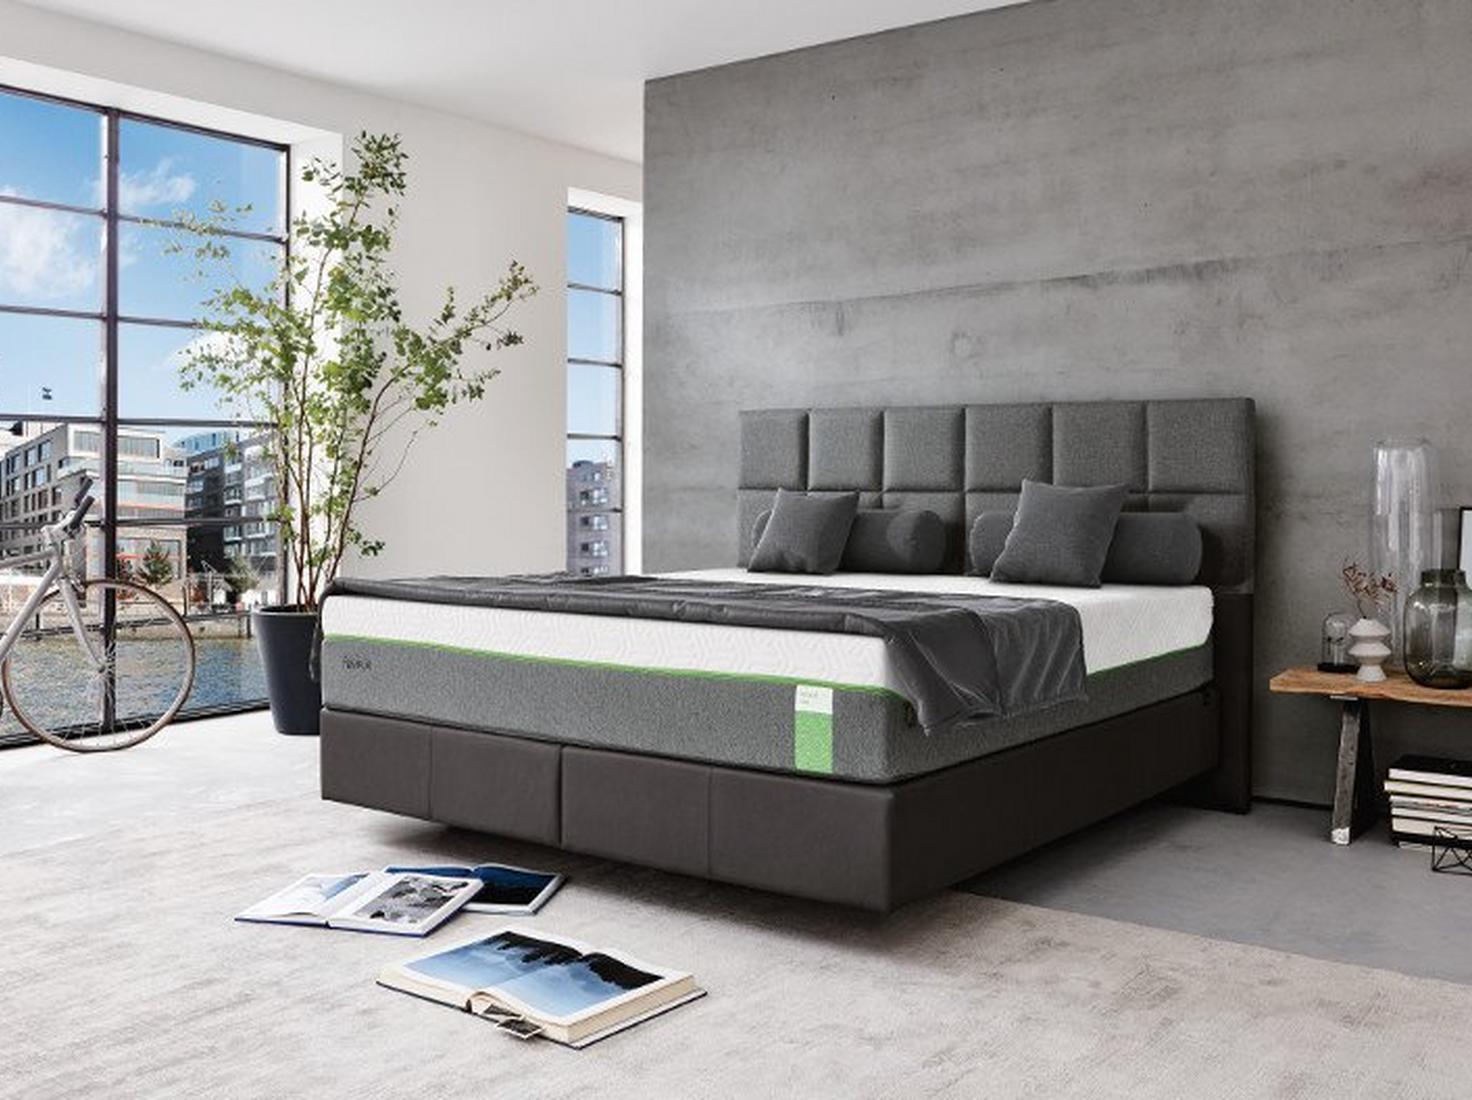 łóżko Tempur Box Spring Statyczne